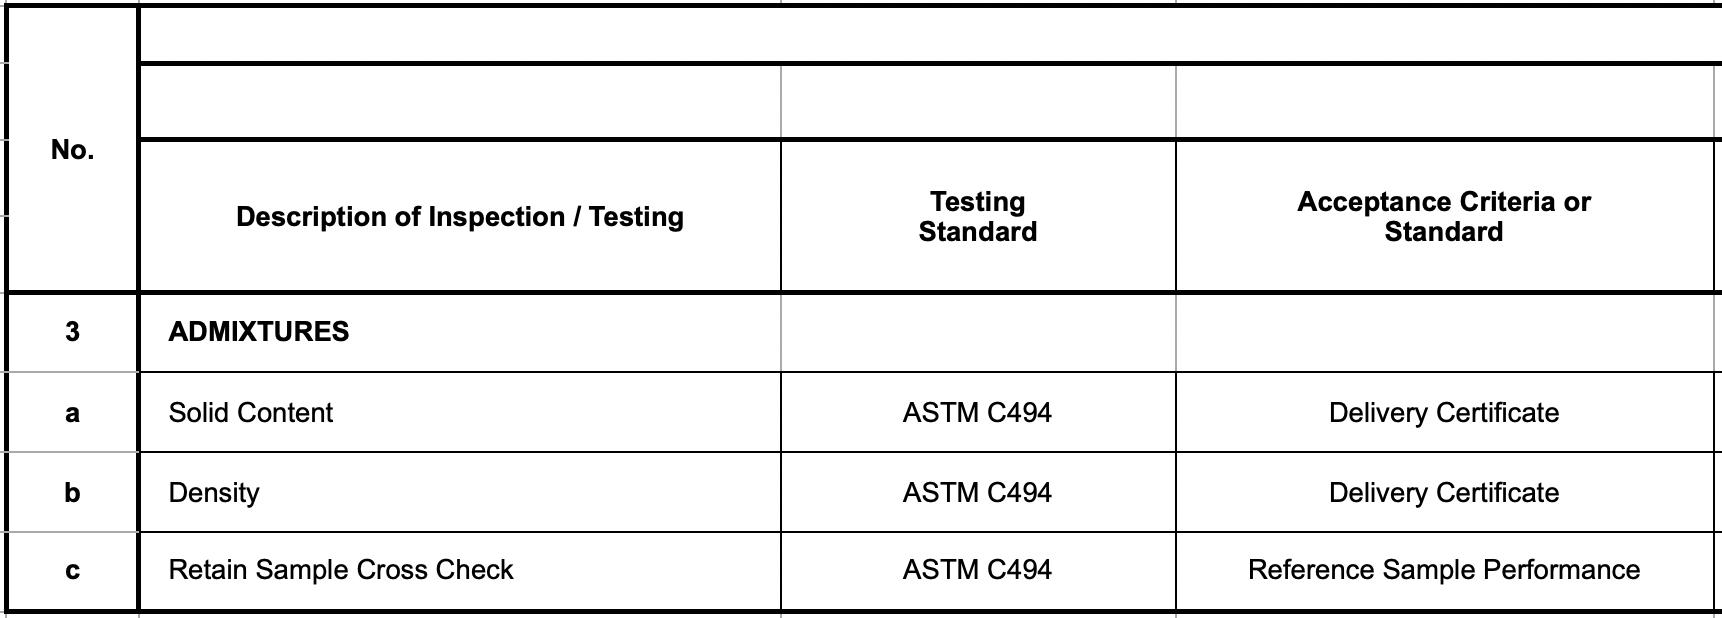 Description of Inspection / Testing -- Admixture